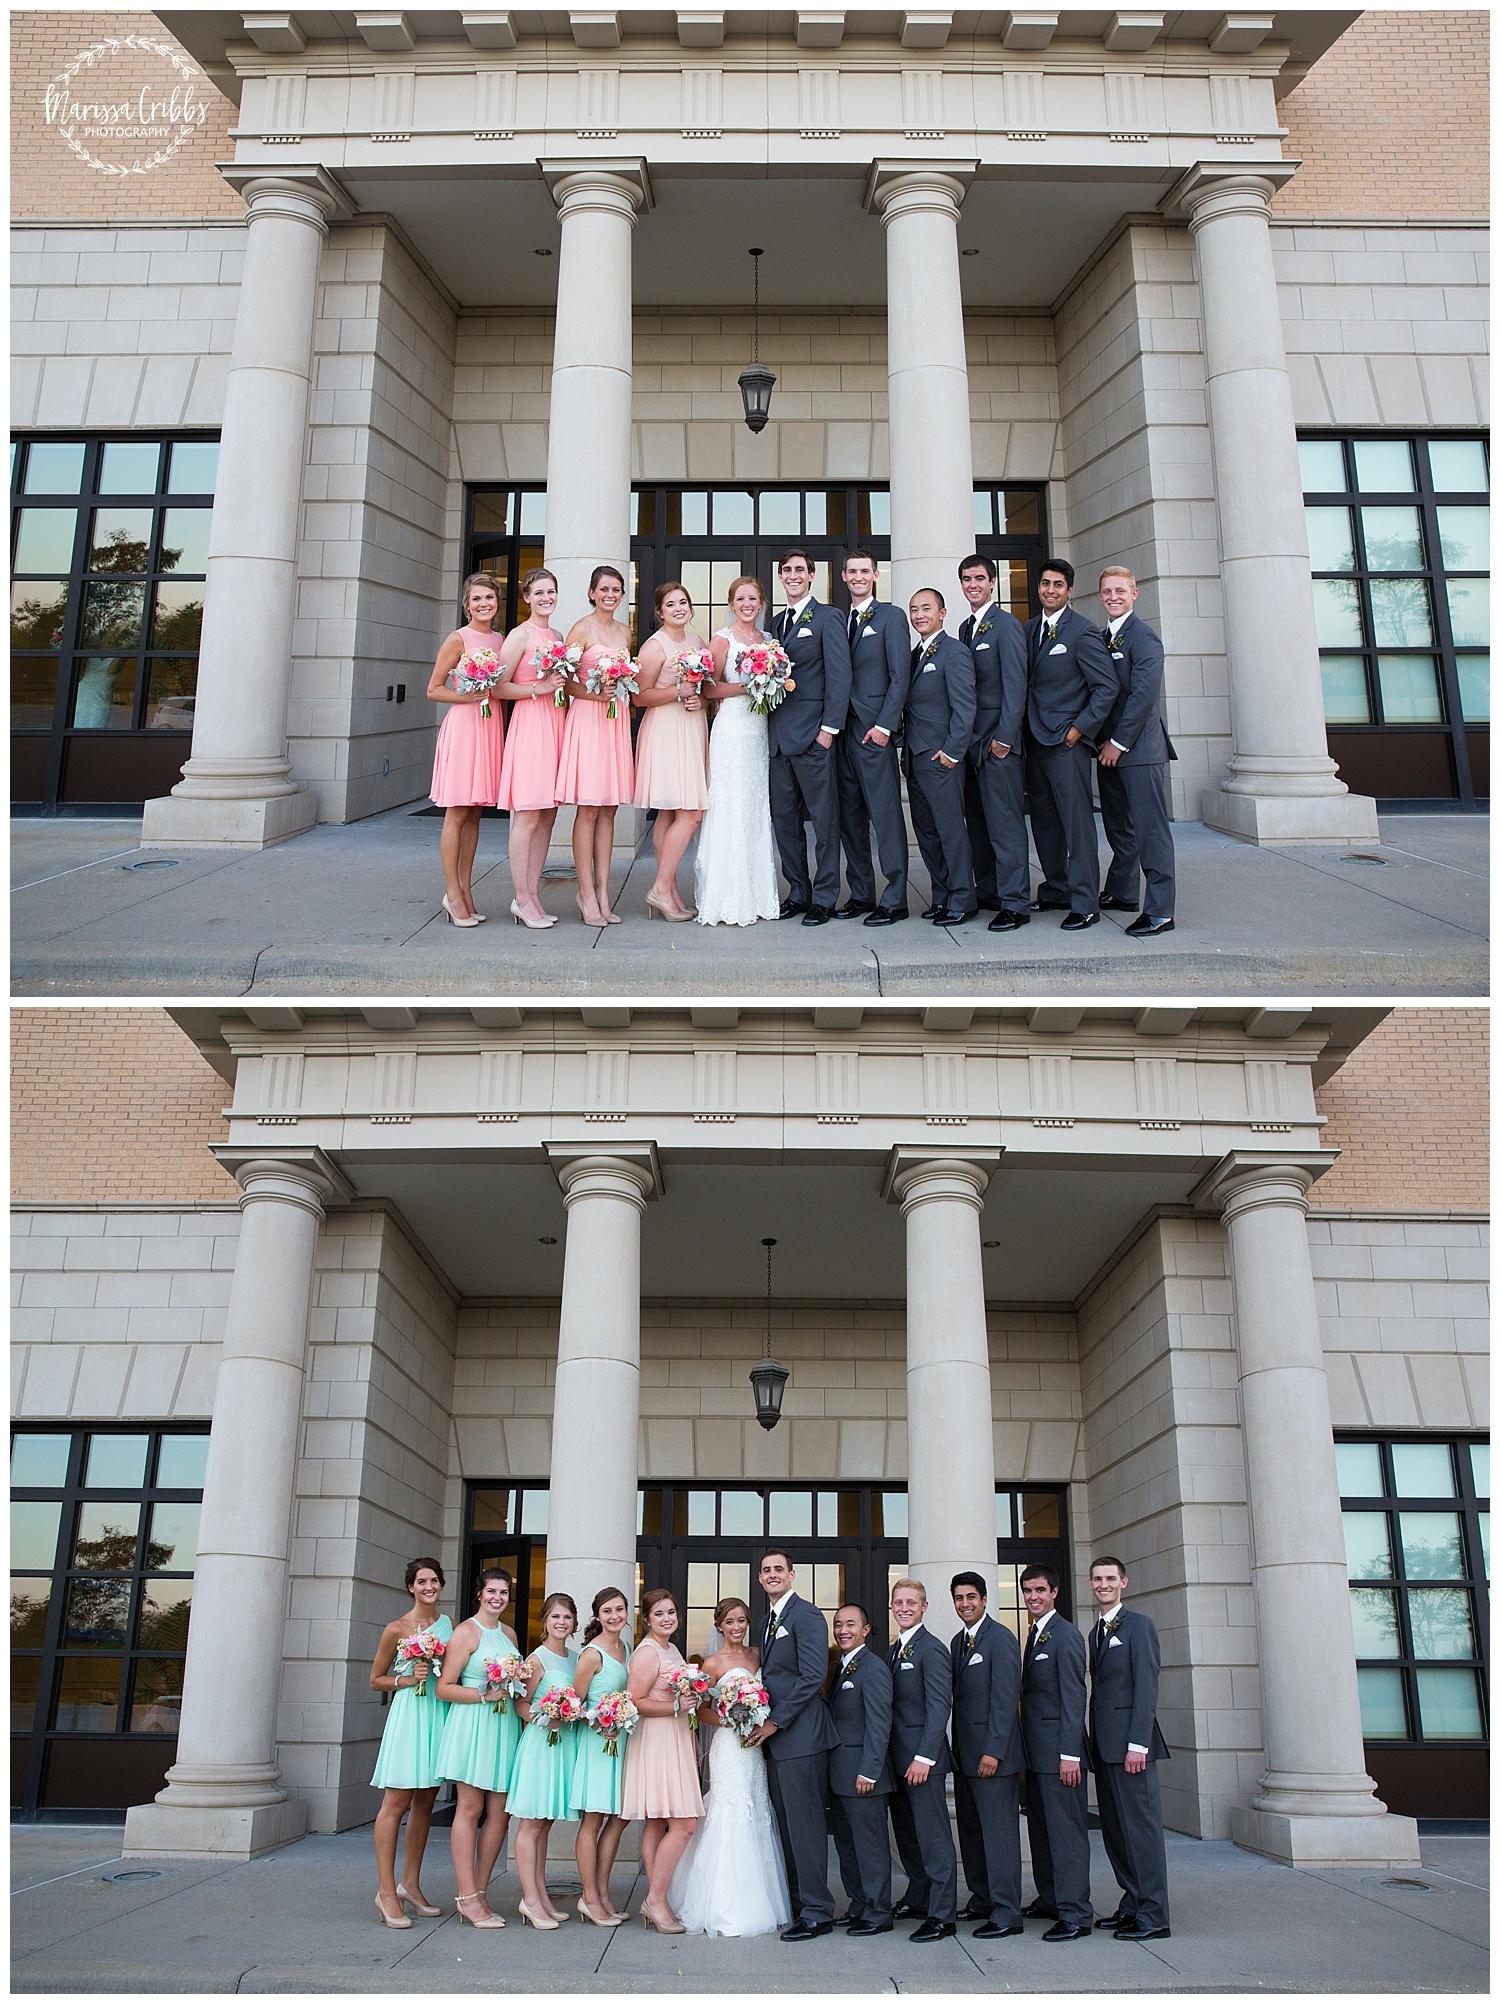 Twin Double Wedding | Union Horse Distilling Co. | Marissa Cribbs Photography | KC Weddings_0161.jpg